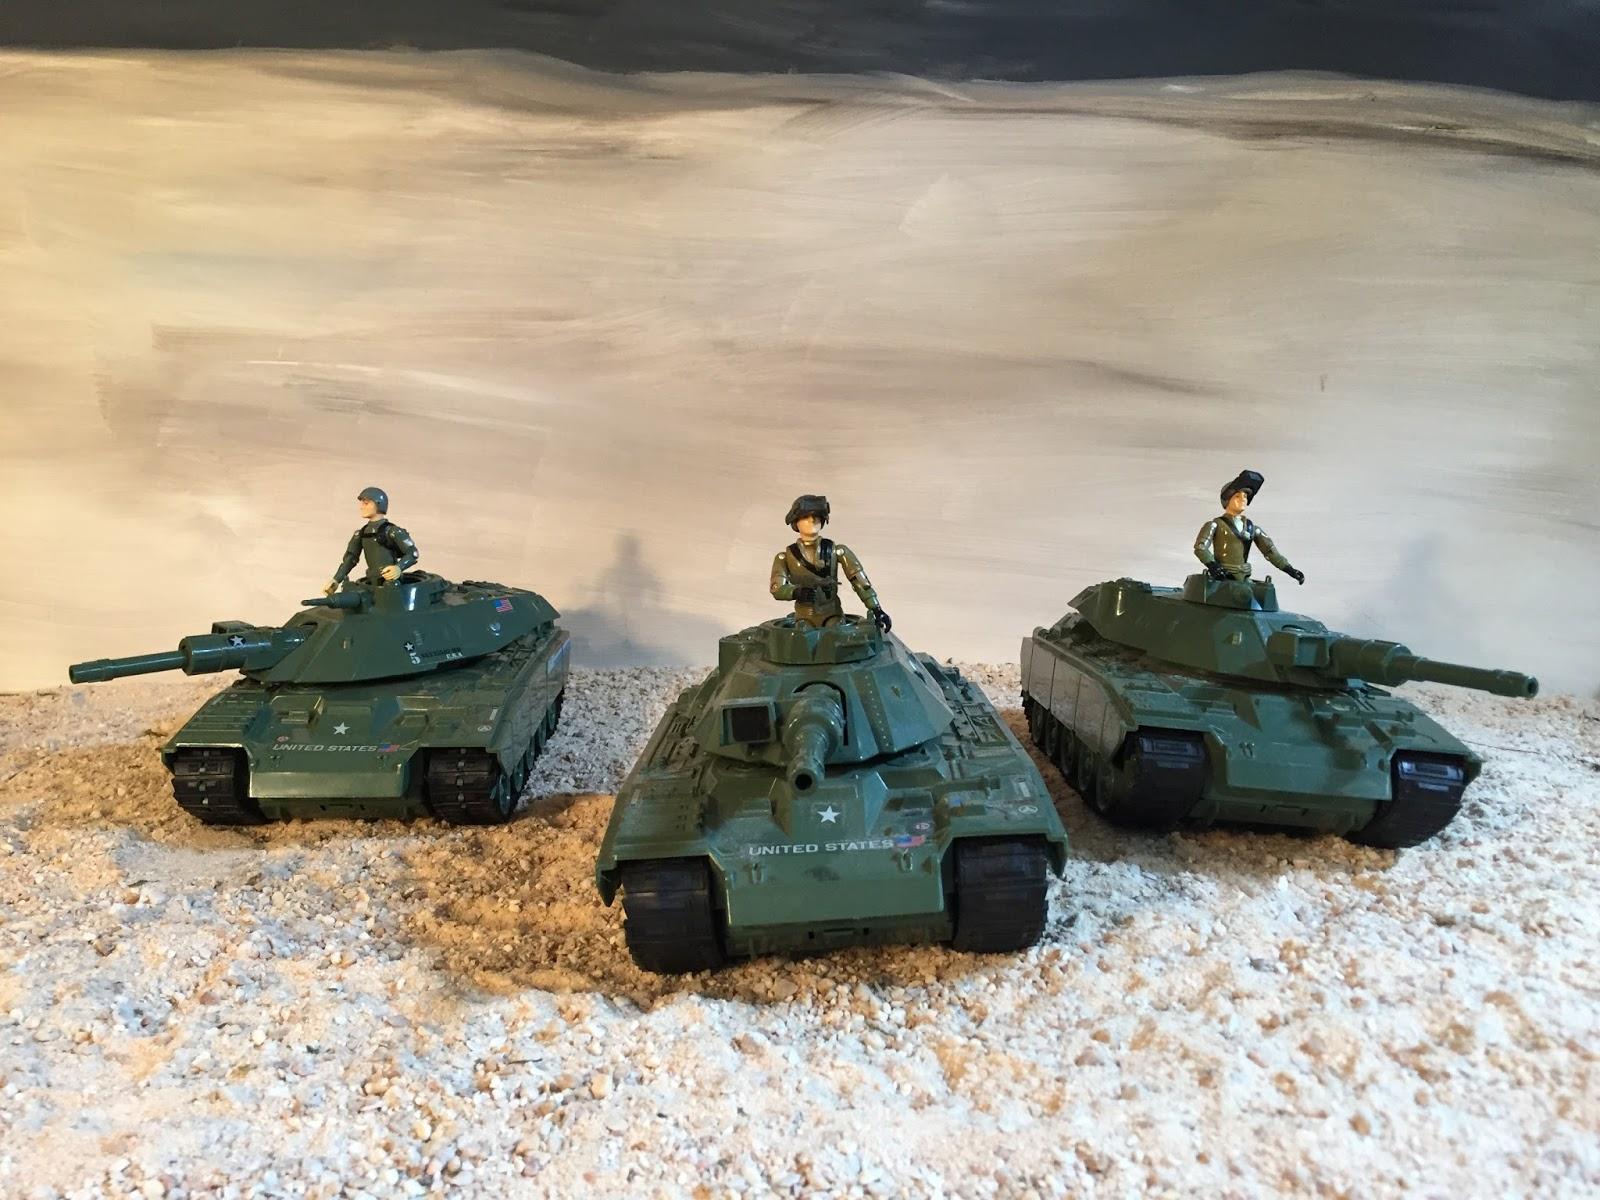 household items, GI Joe battle tanks